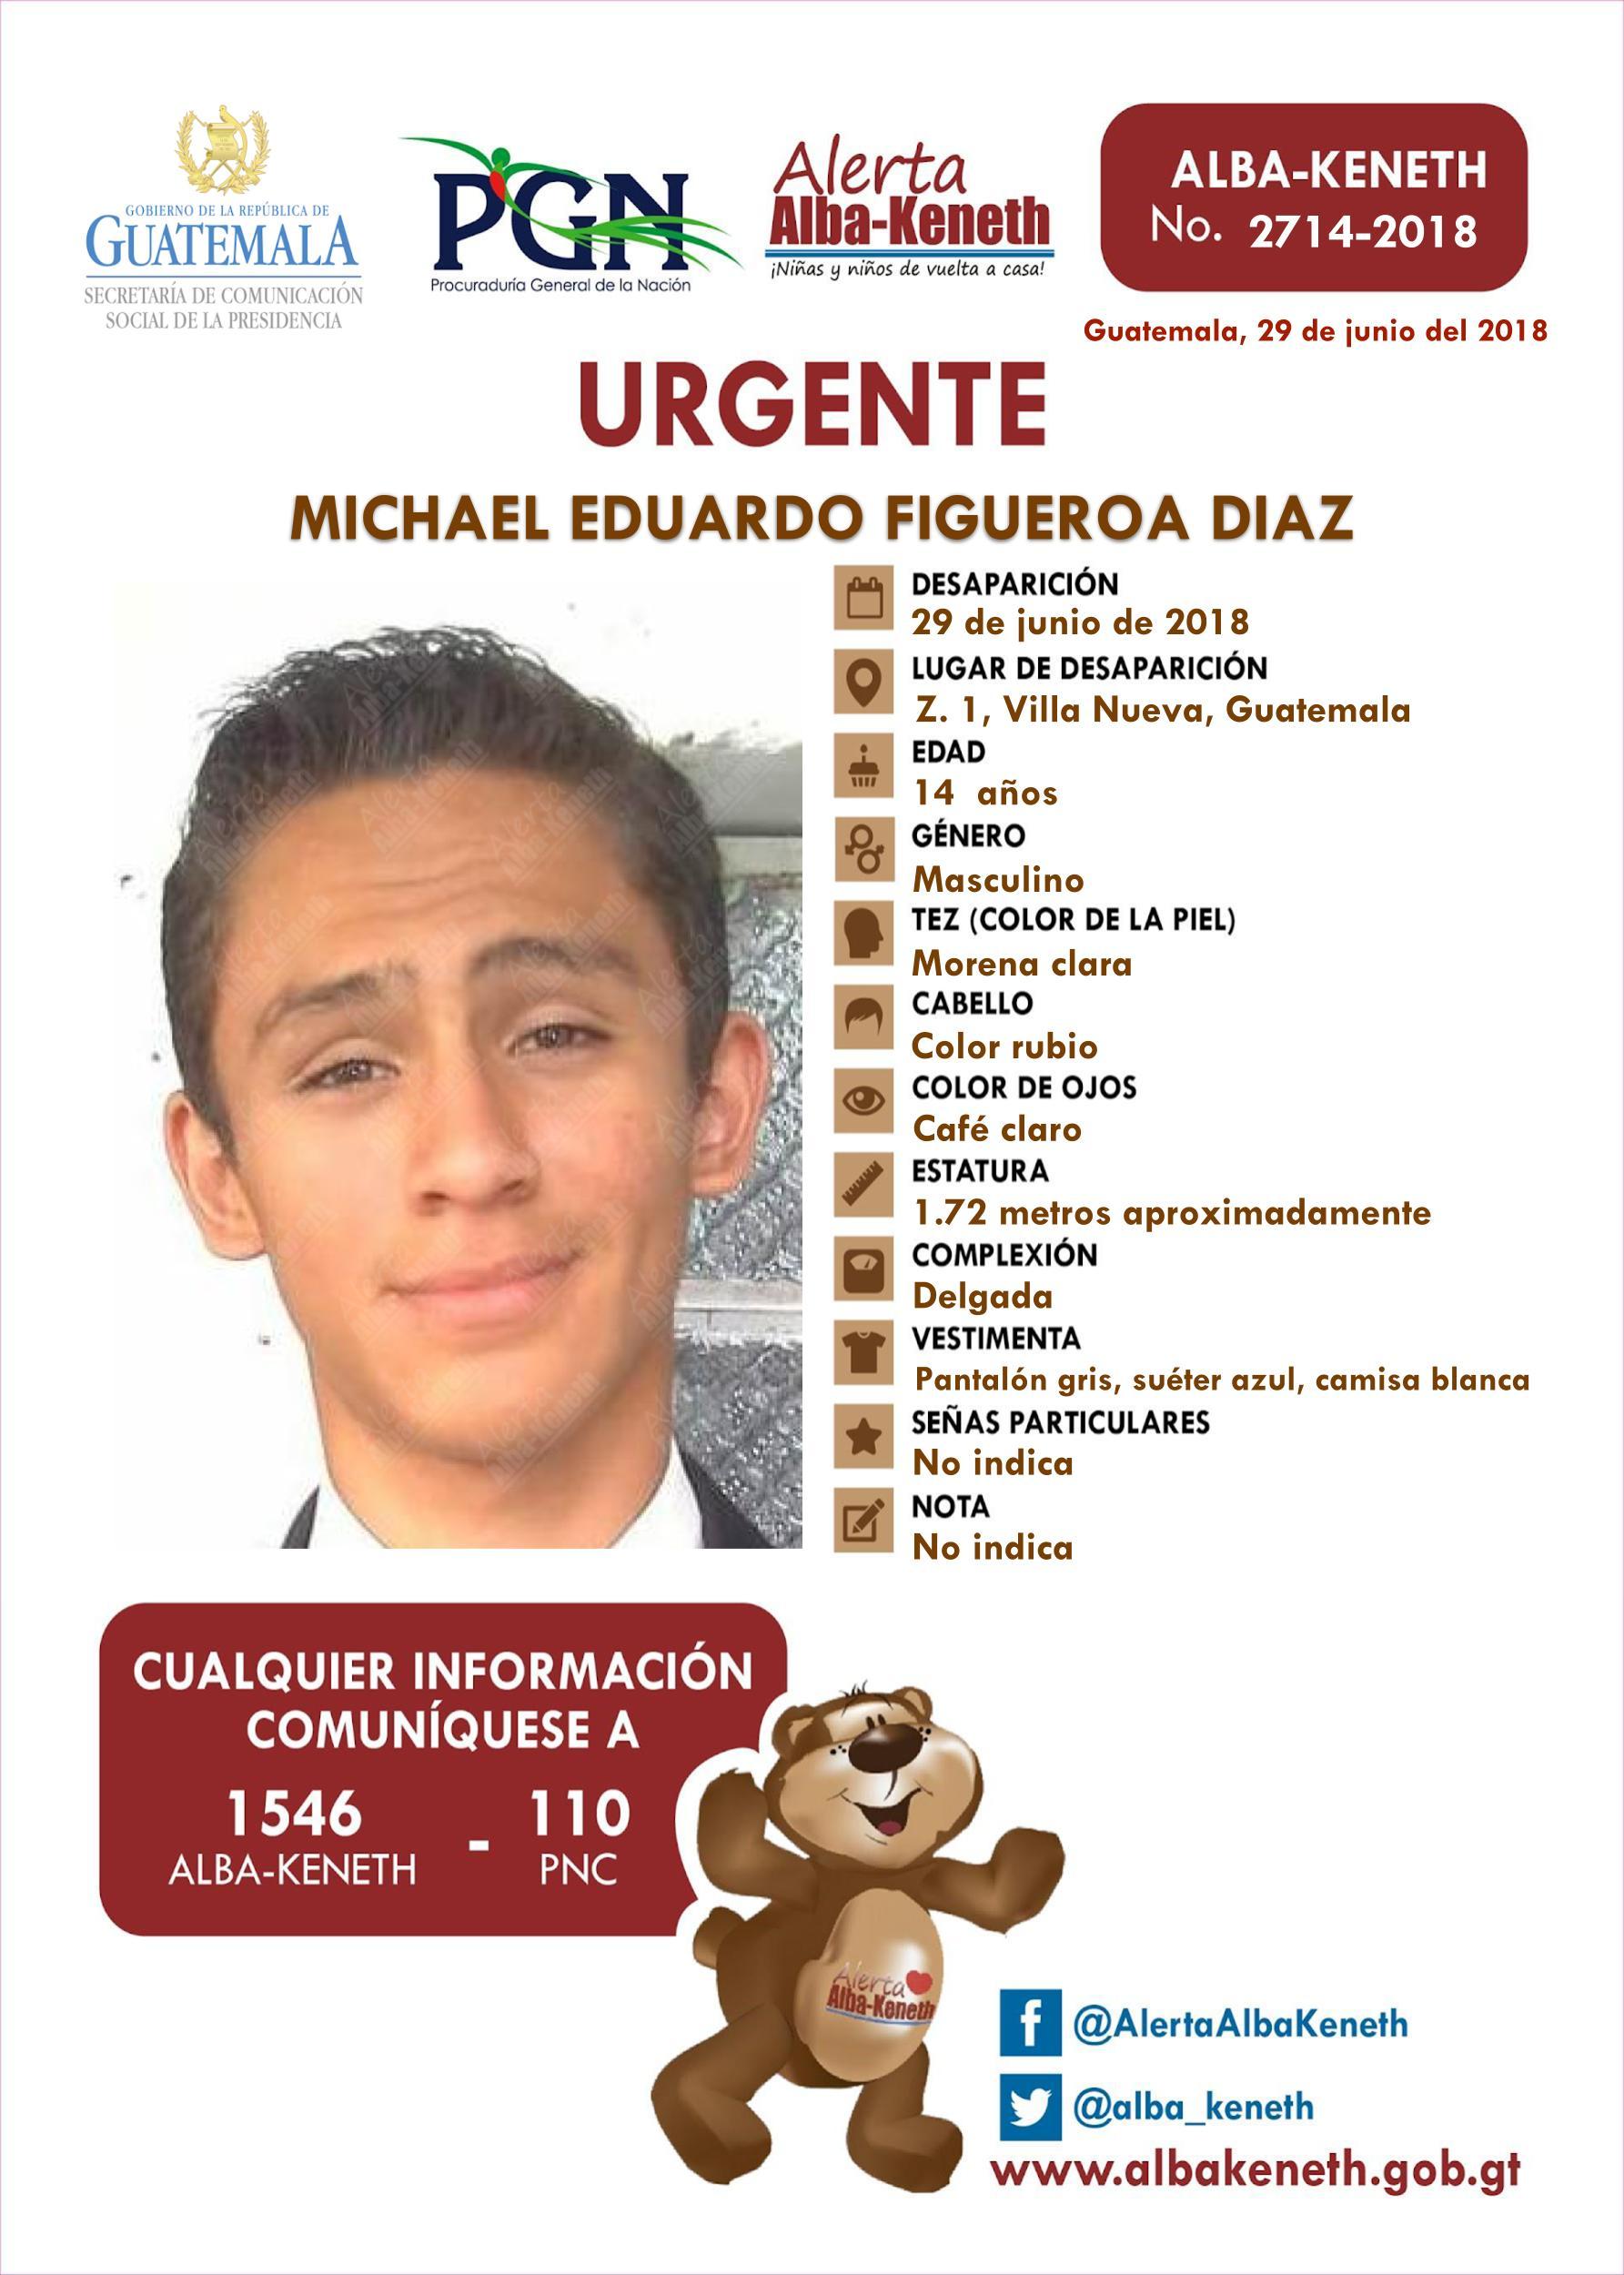 Michael Eduardo Figueroa Diaz